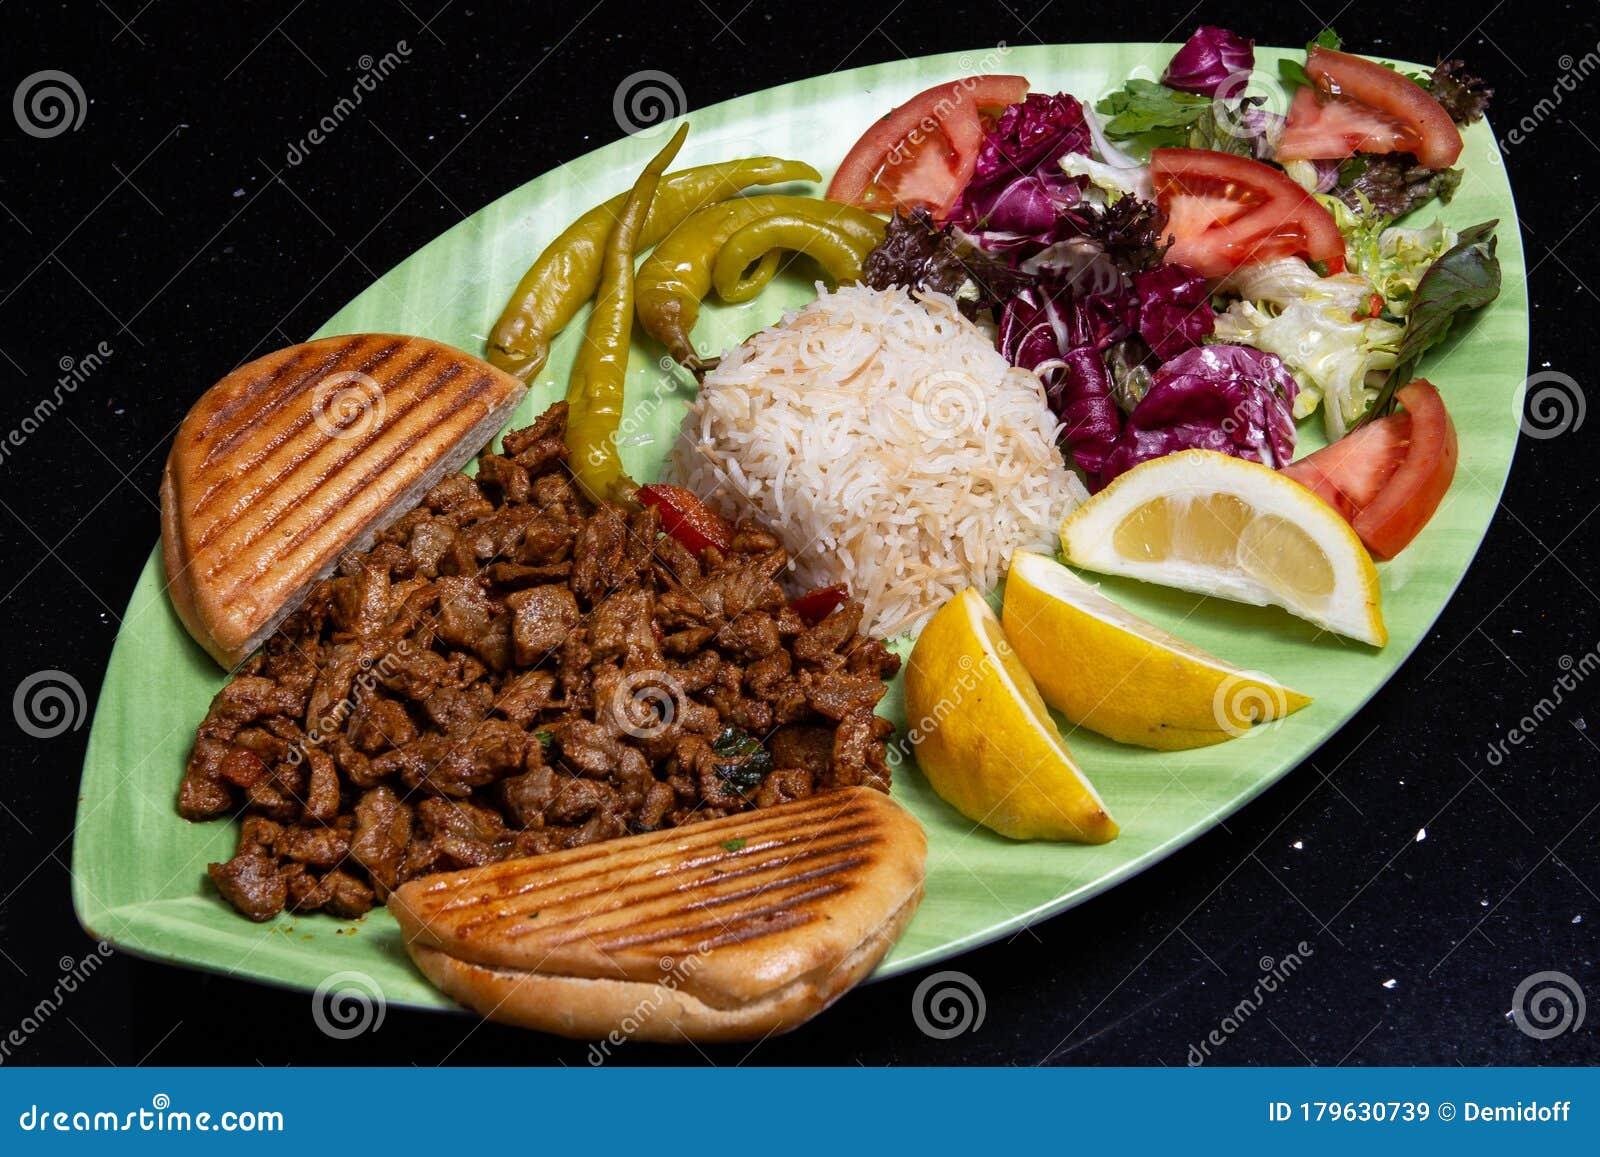 Turkish Kebab Plate Stock Image Image Of Traditional 179630739